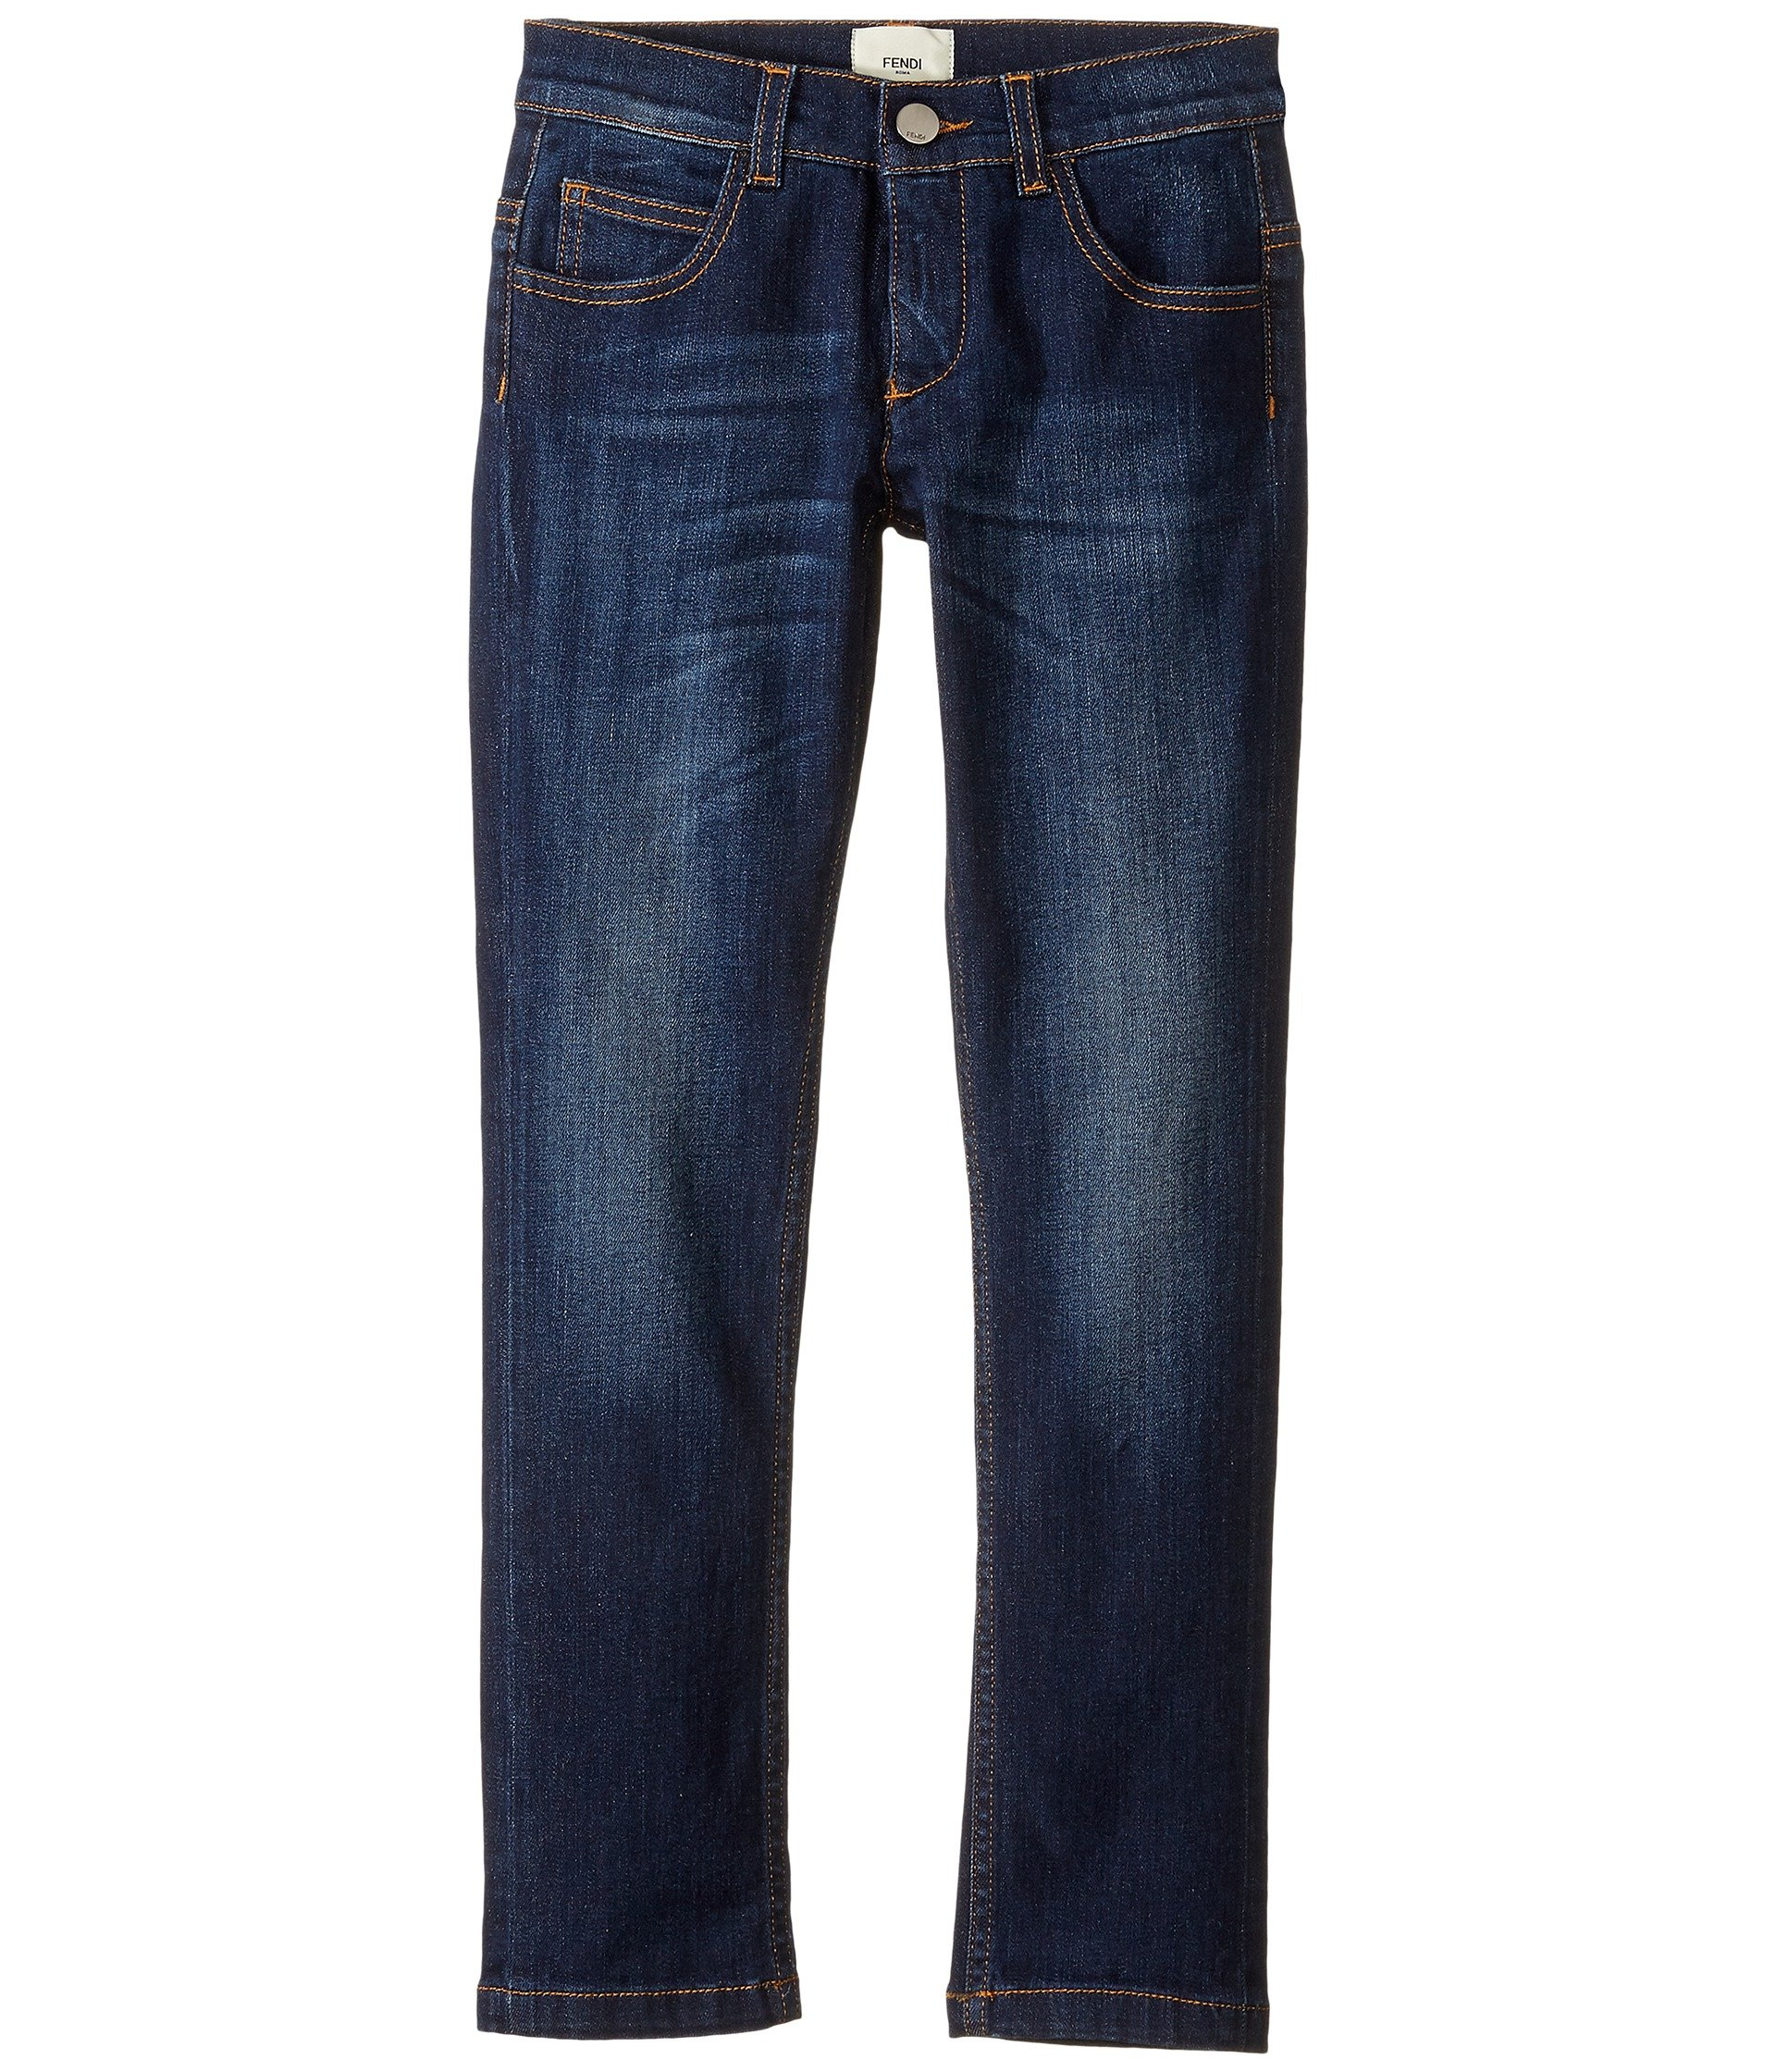 Fendi Kids Boys' Denim Pants With Monster Logo Back Pocket (Little Kids), Blue Denim, 6 Years X One Size by Fendi Kids